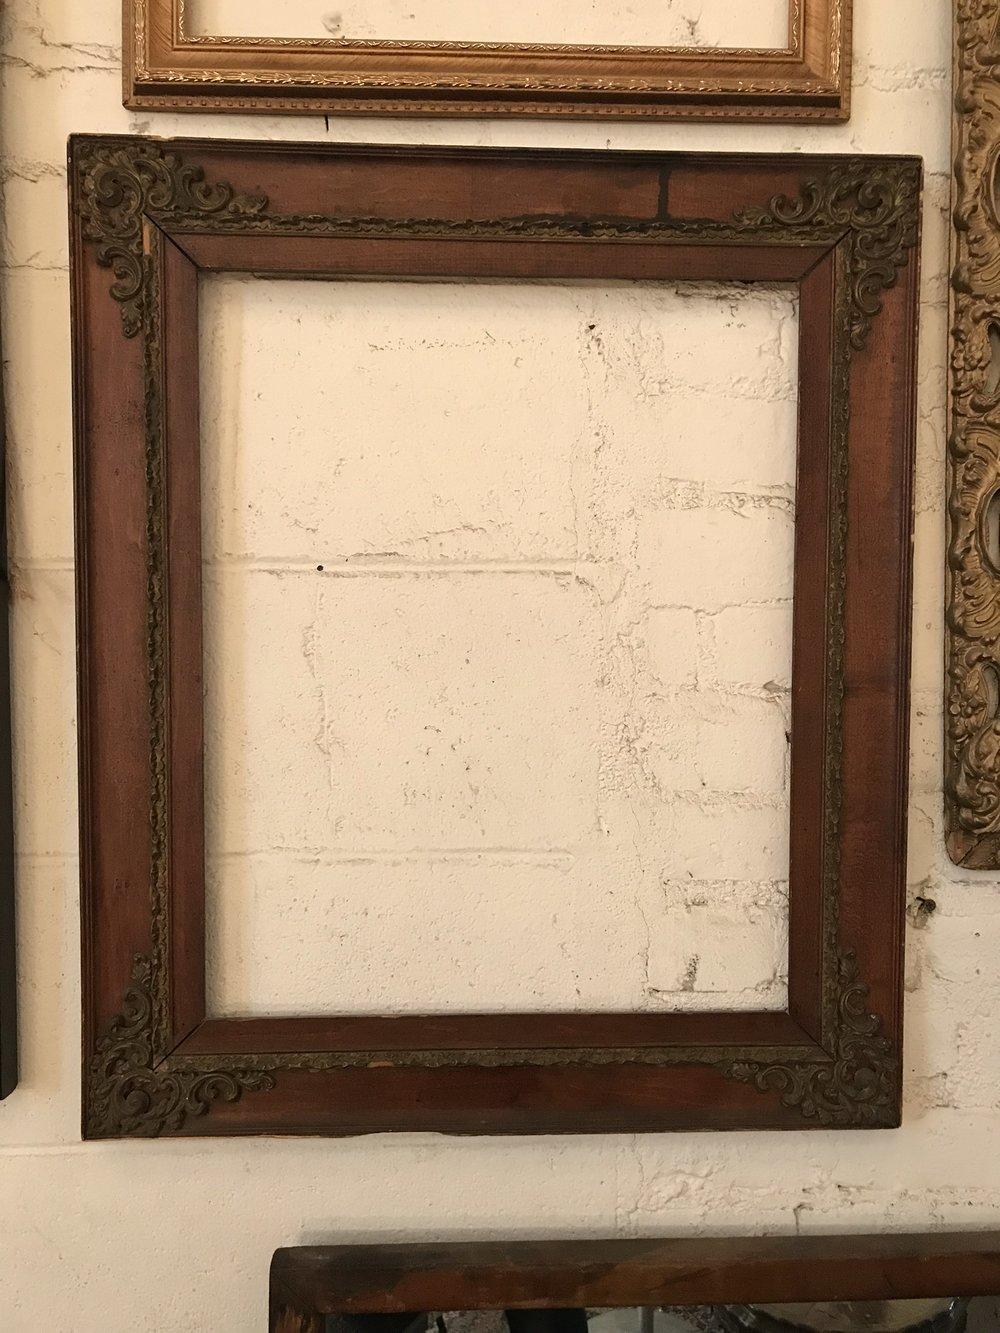 Ornate corners dark wood frame